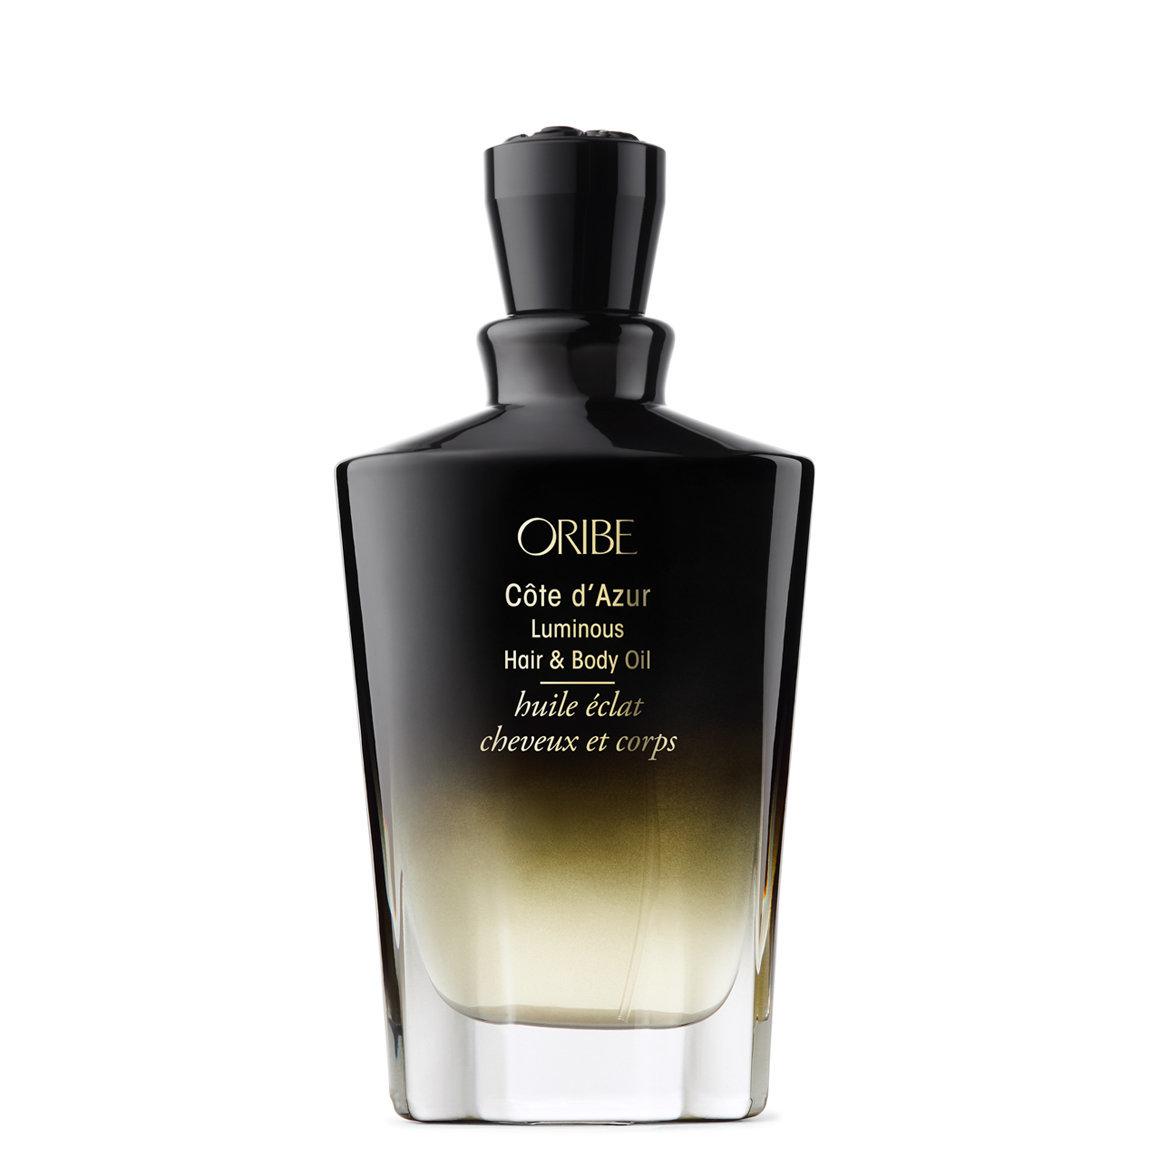 Oribe Côte d'Azur Luminous Hair & Body Oil alternative view 1 - product swatch.